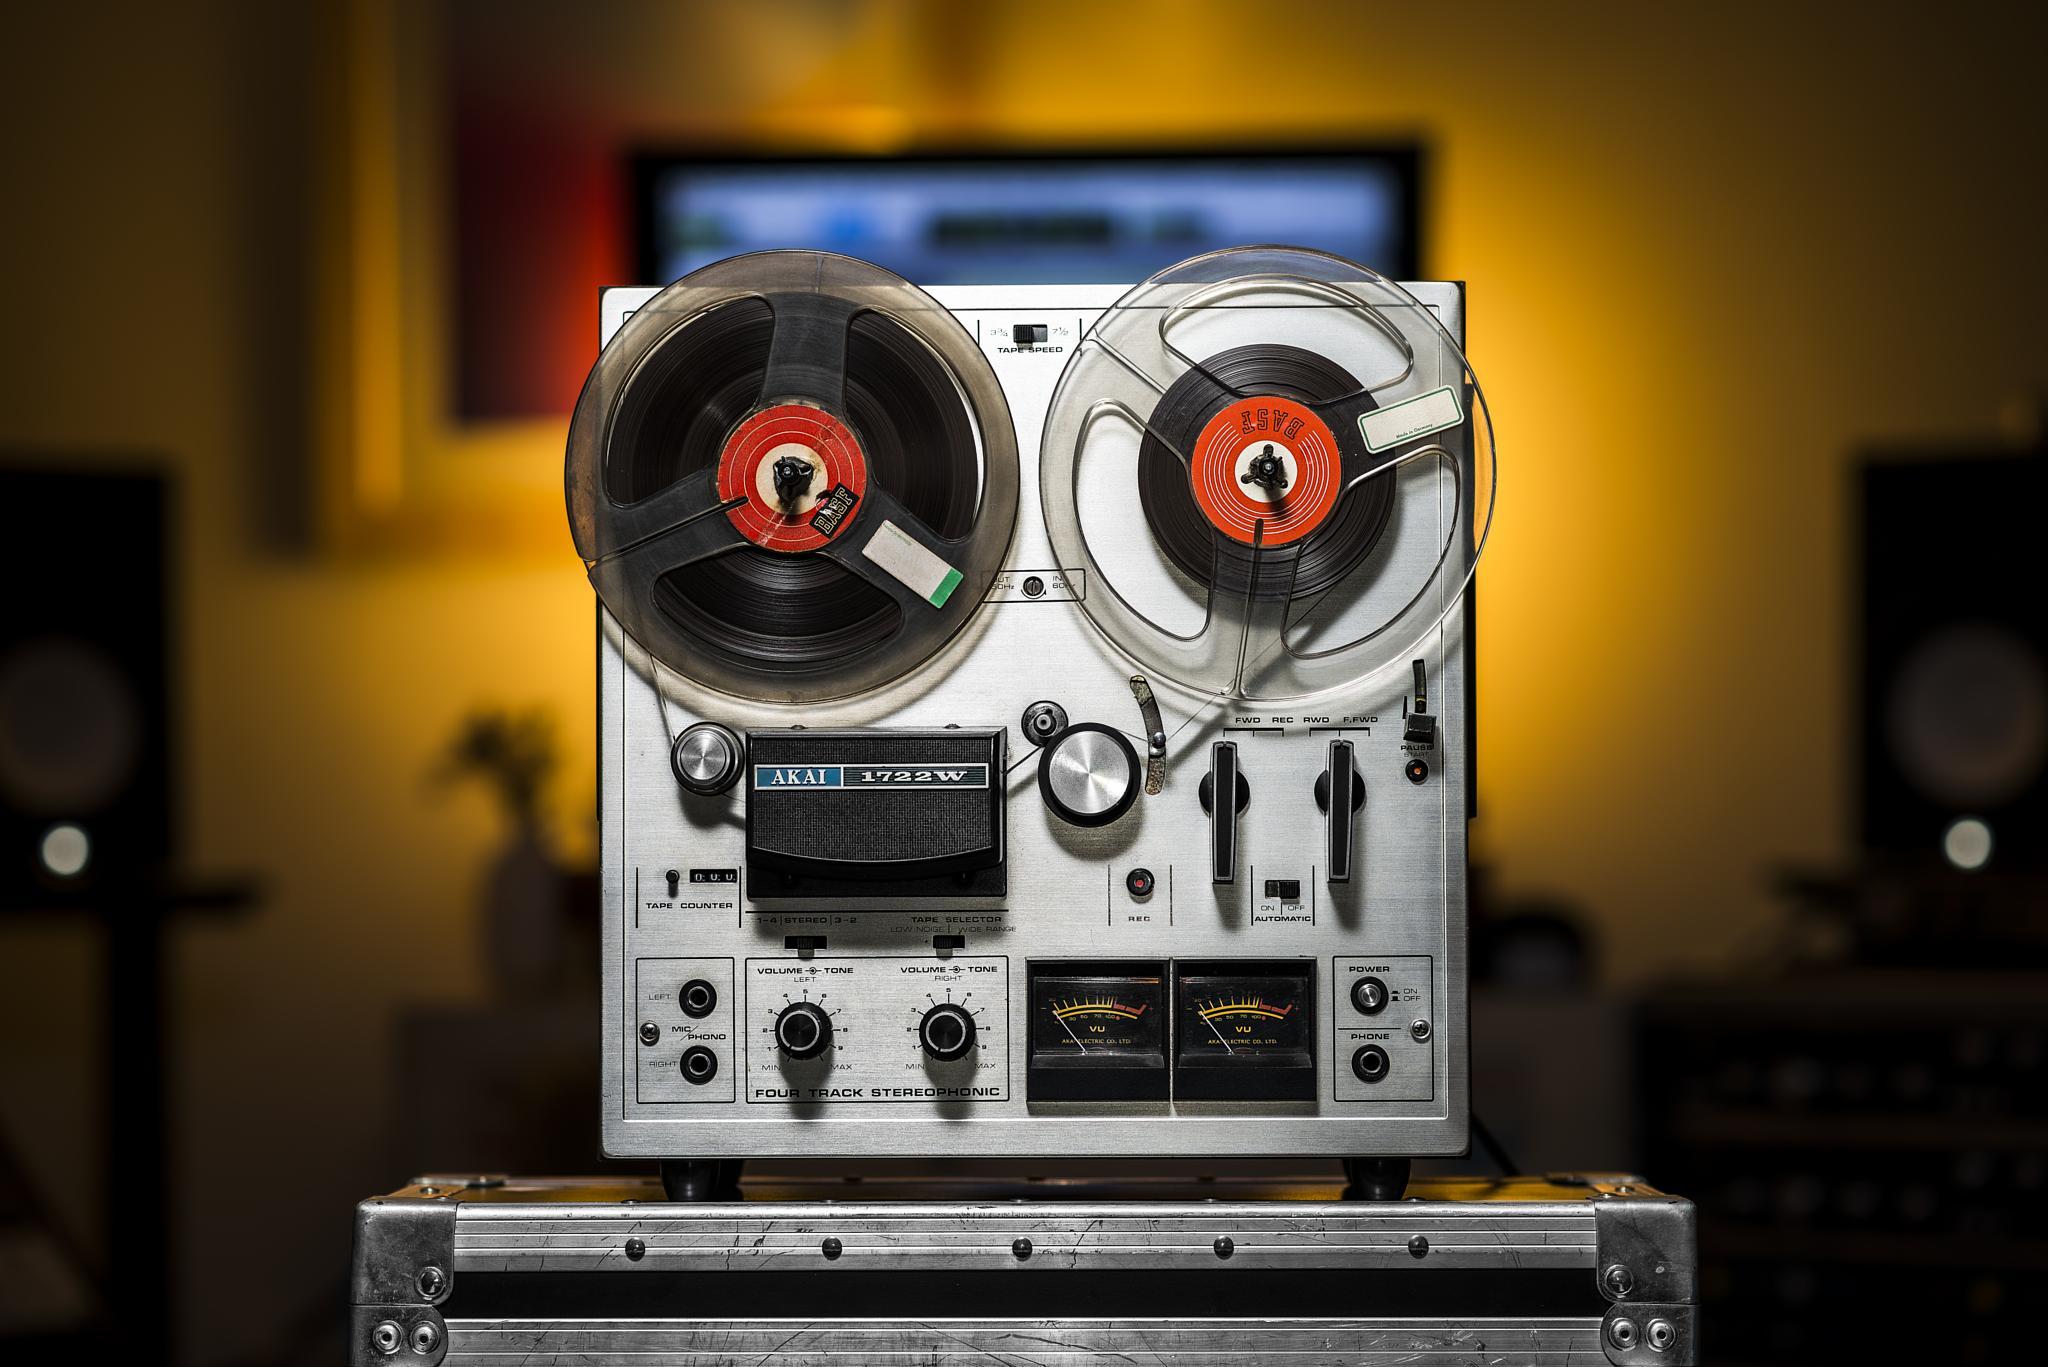 Salvaje Sound Studio by alxmurray